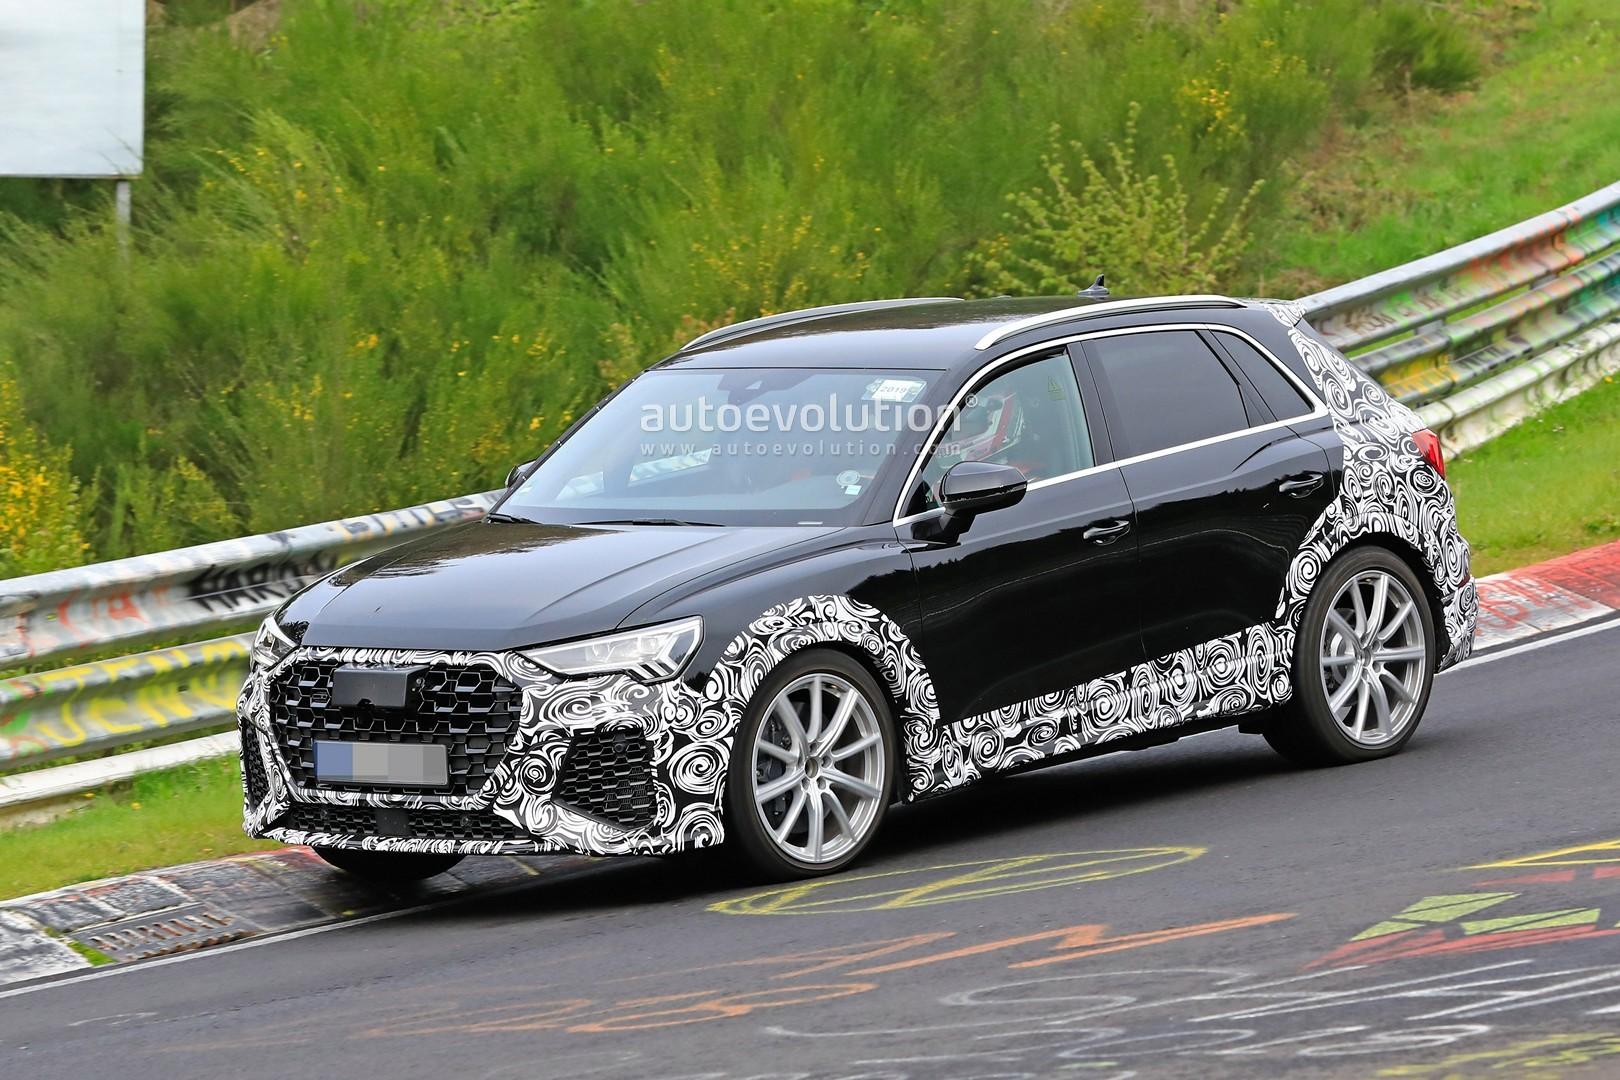 Black 2020 Audi Rs Q3 Spied At The Nurburgring Looks Menacing